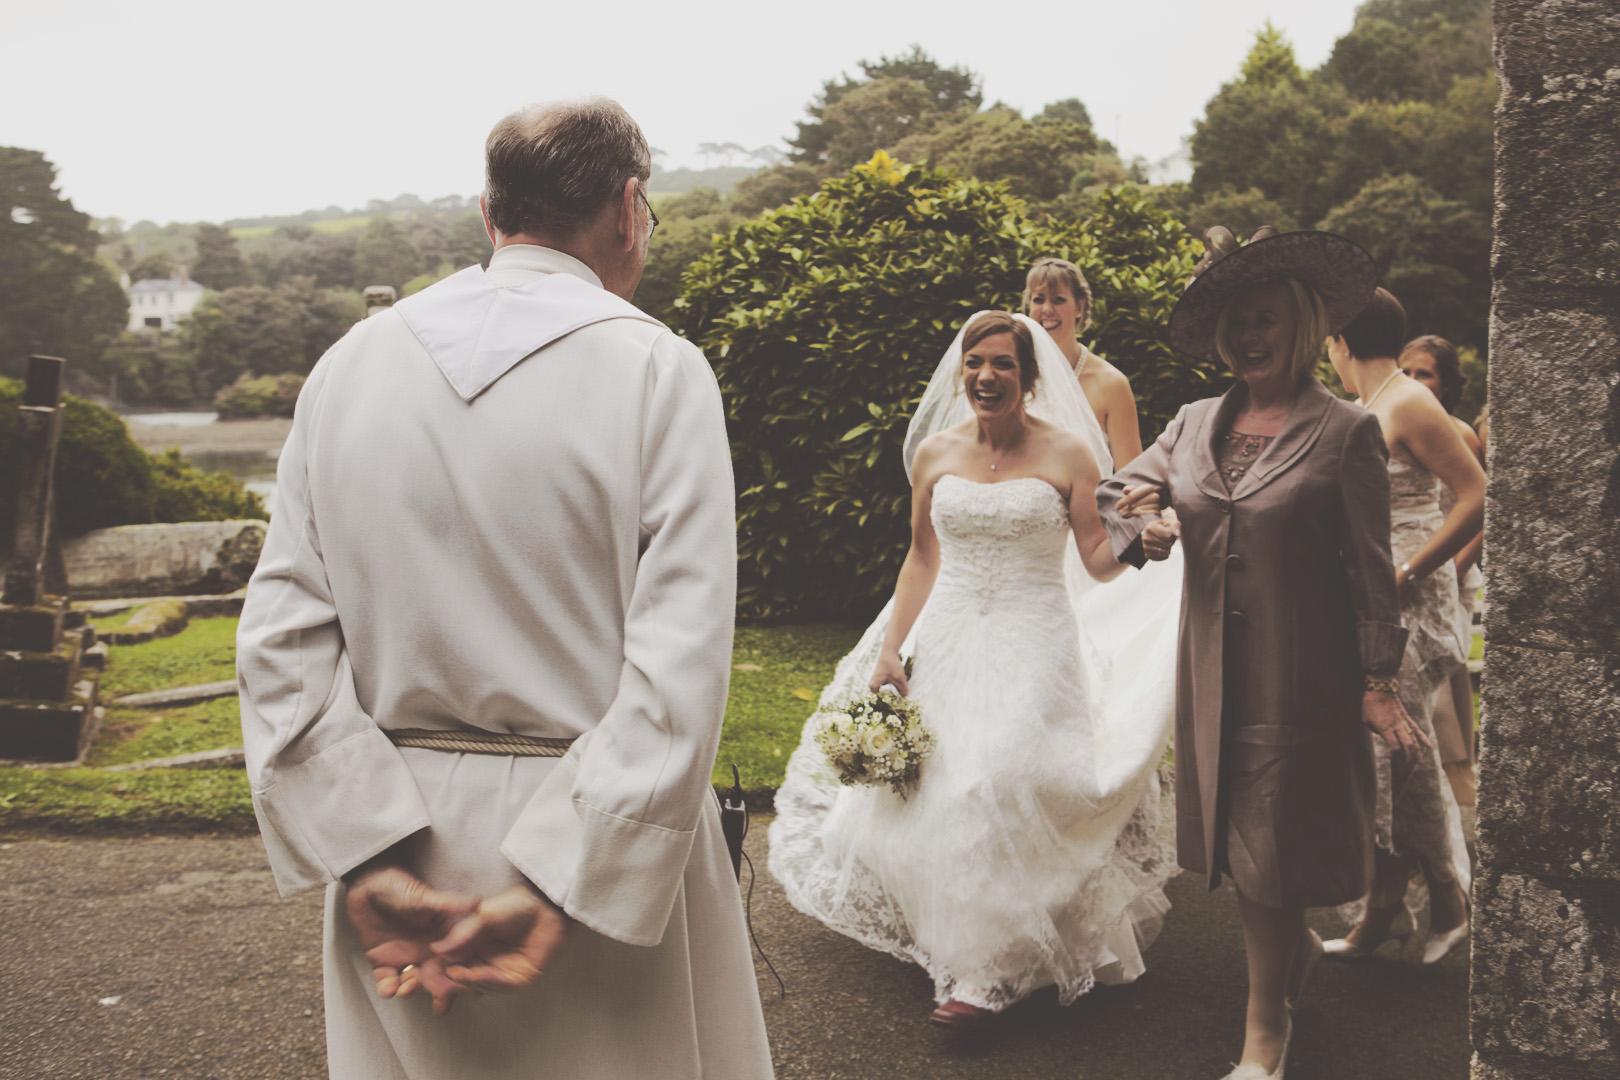 wedding_280913_4926